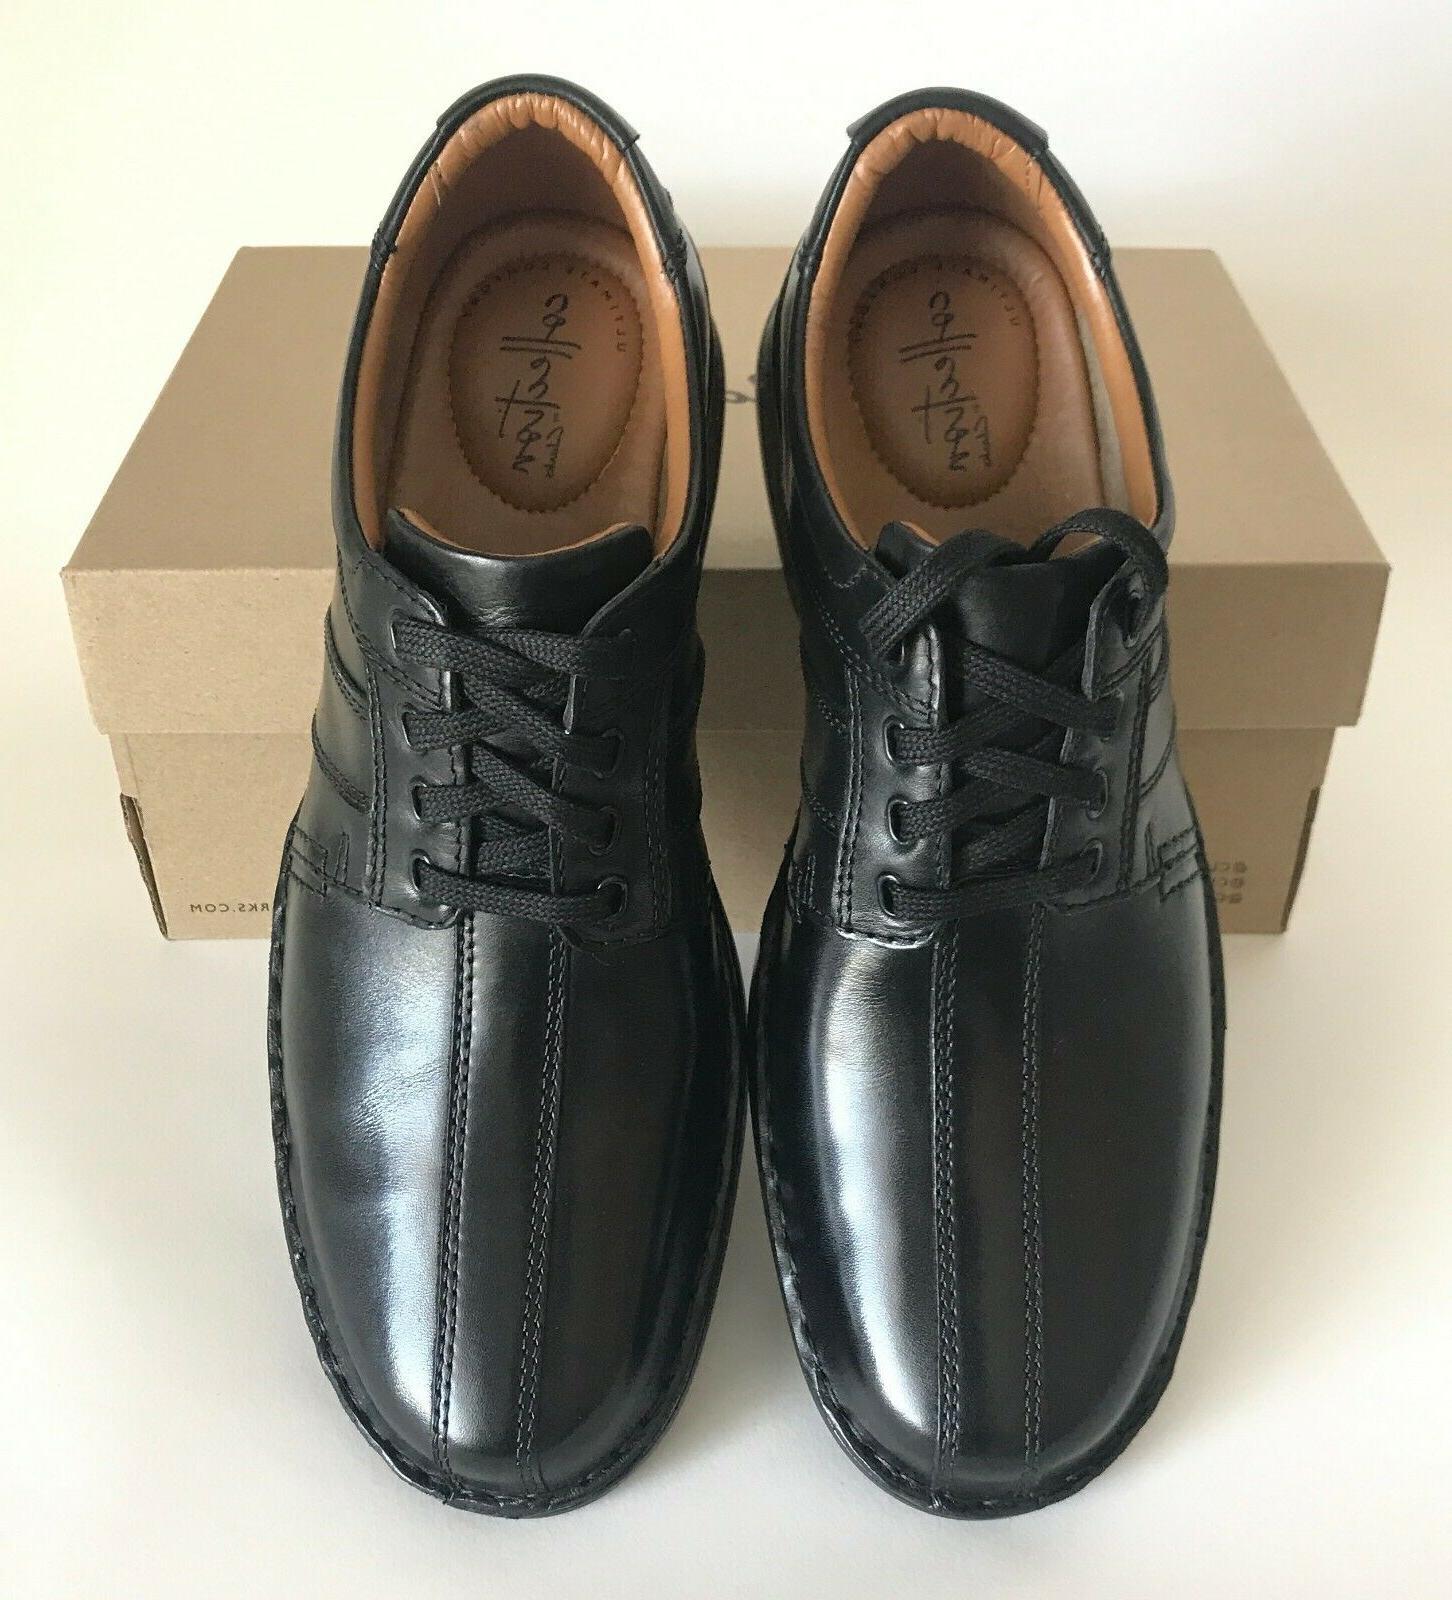 Clarks Men's Touareg Vibe Wide Oxford Shoes  - 11.5 M